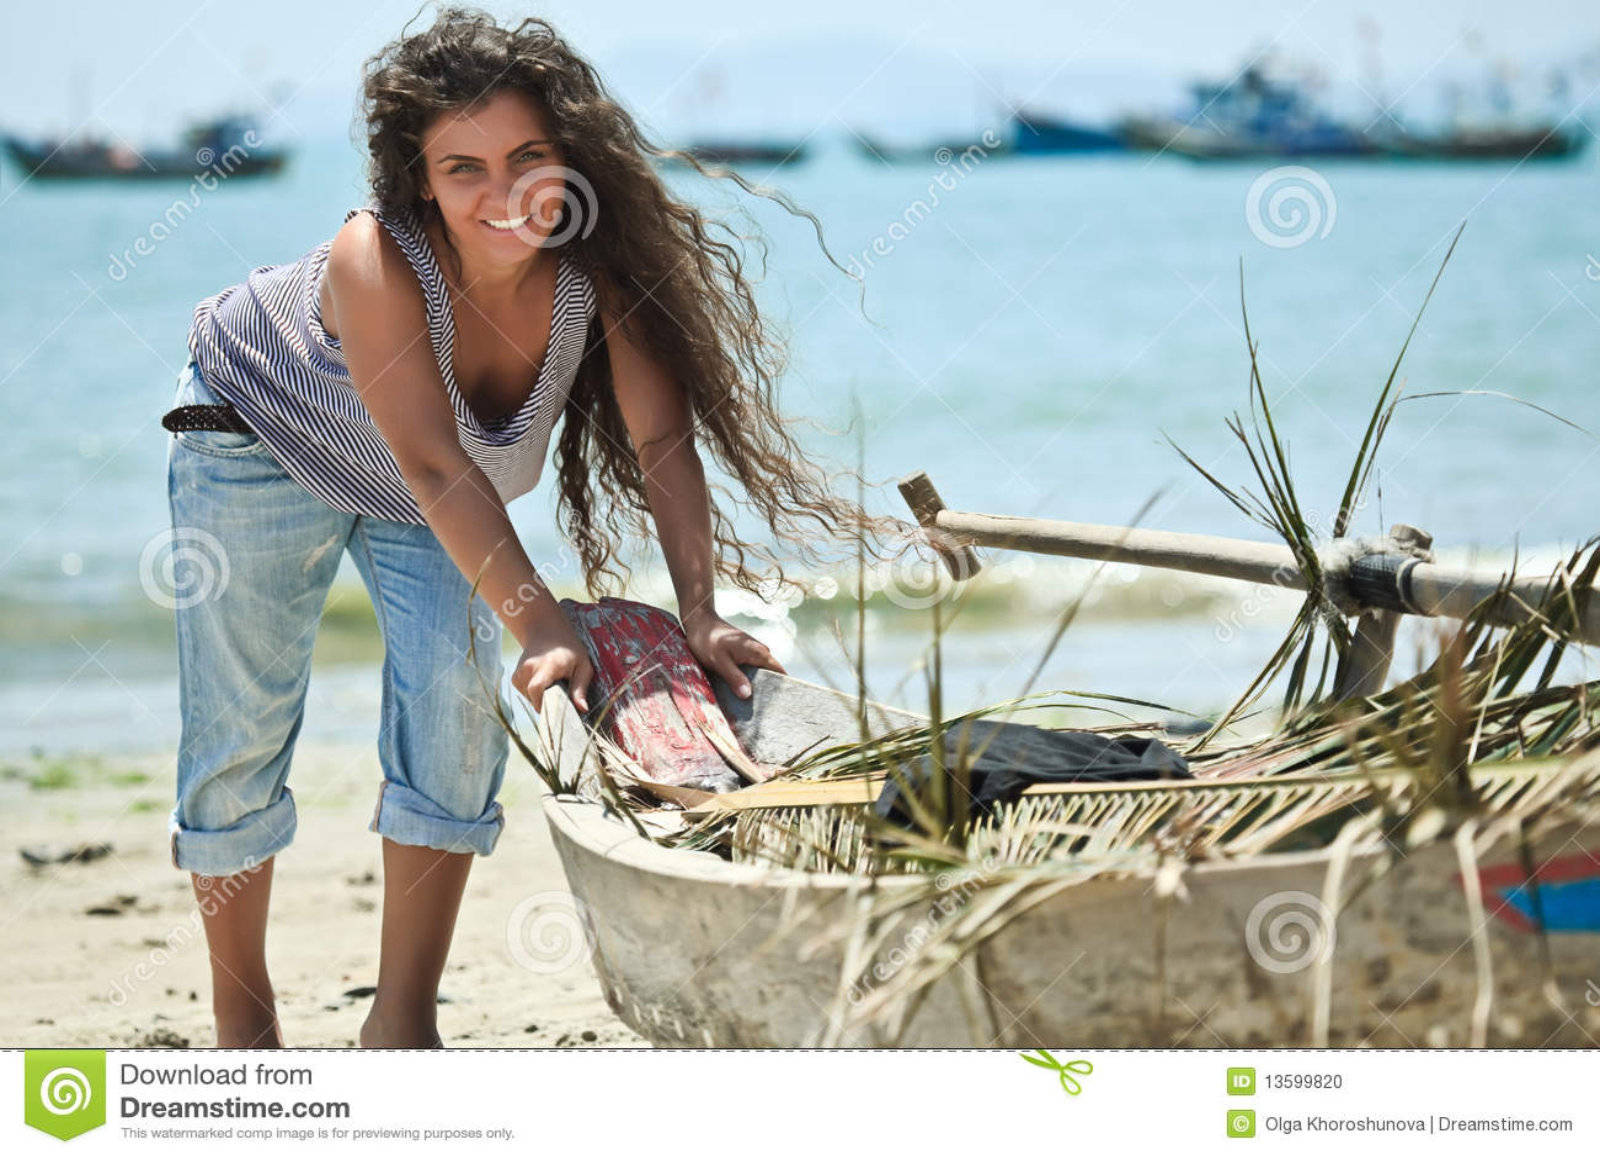 fisherwoman stock photo image 13599820